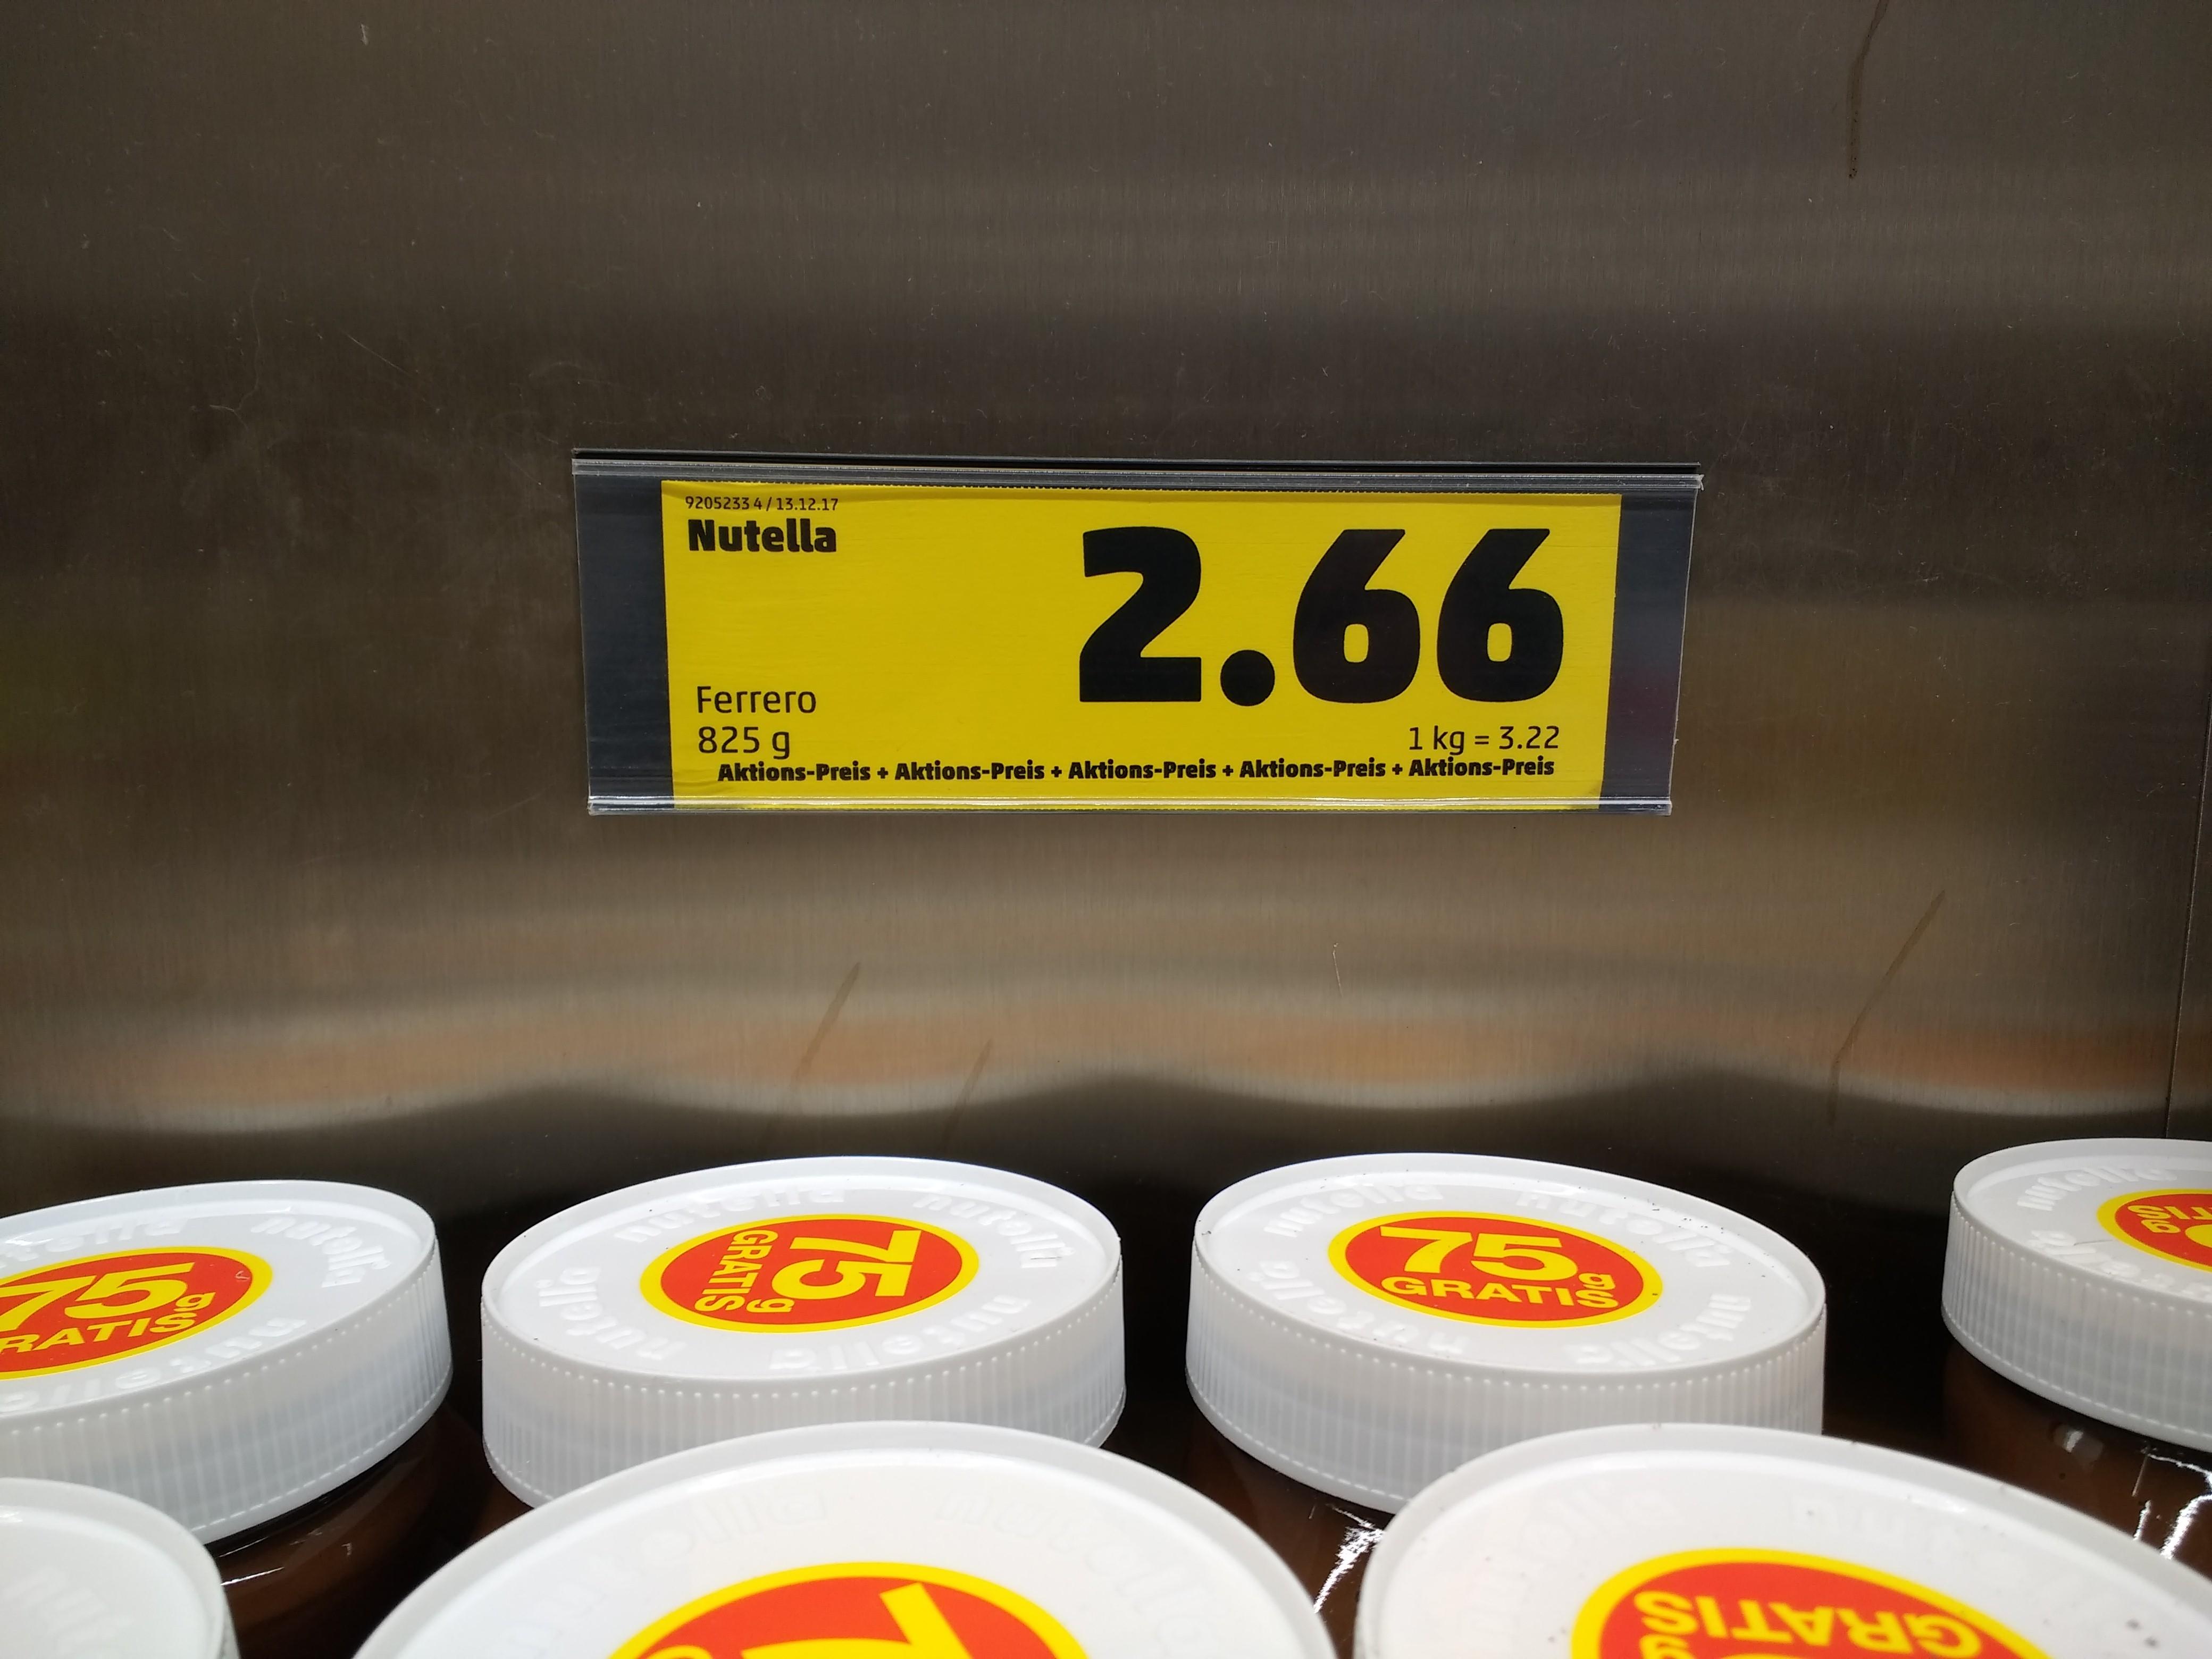 Penny - Nutella 825g für 2,66 = 3,22 €/kg